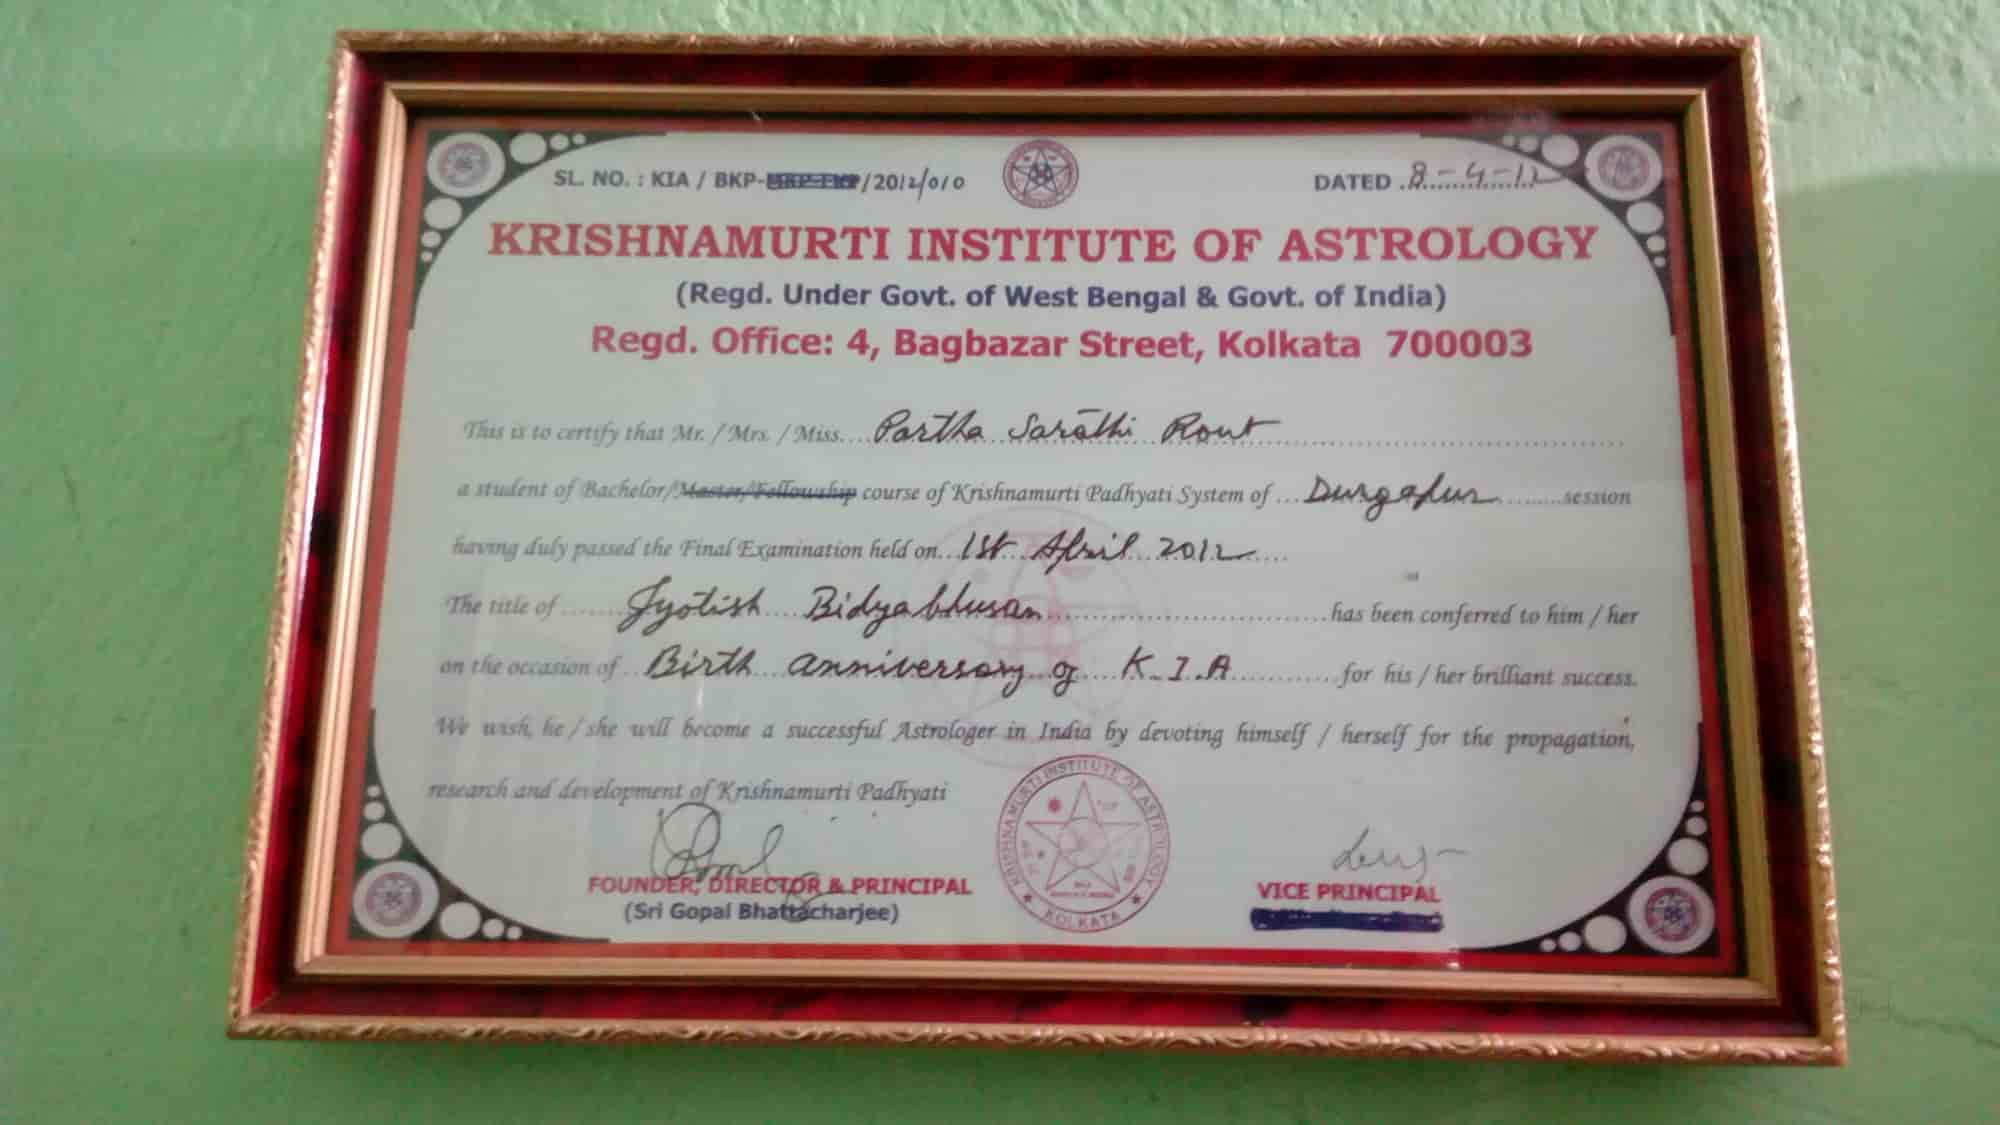 Partha Sarathi Rout, Benachity - Astrologers in Durgapur - Justdial